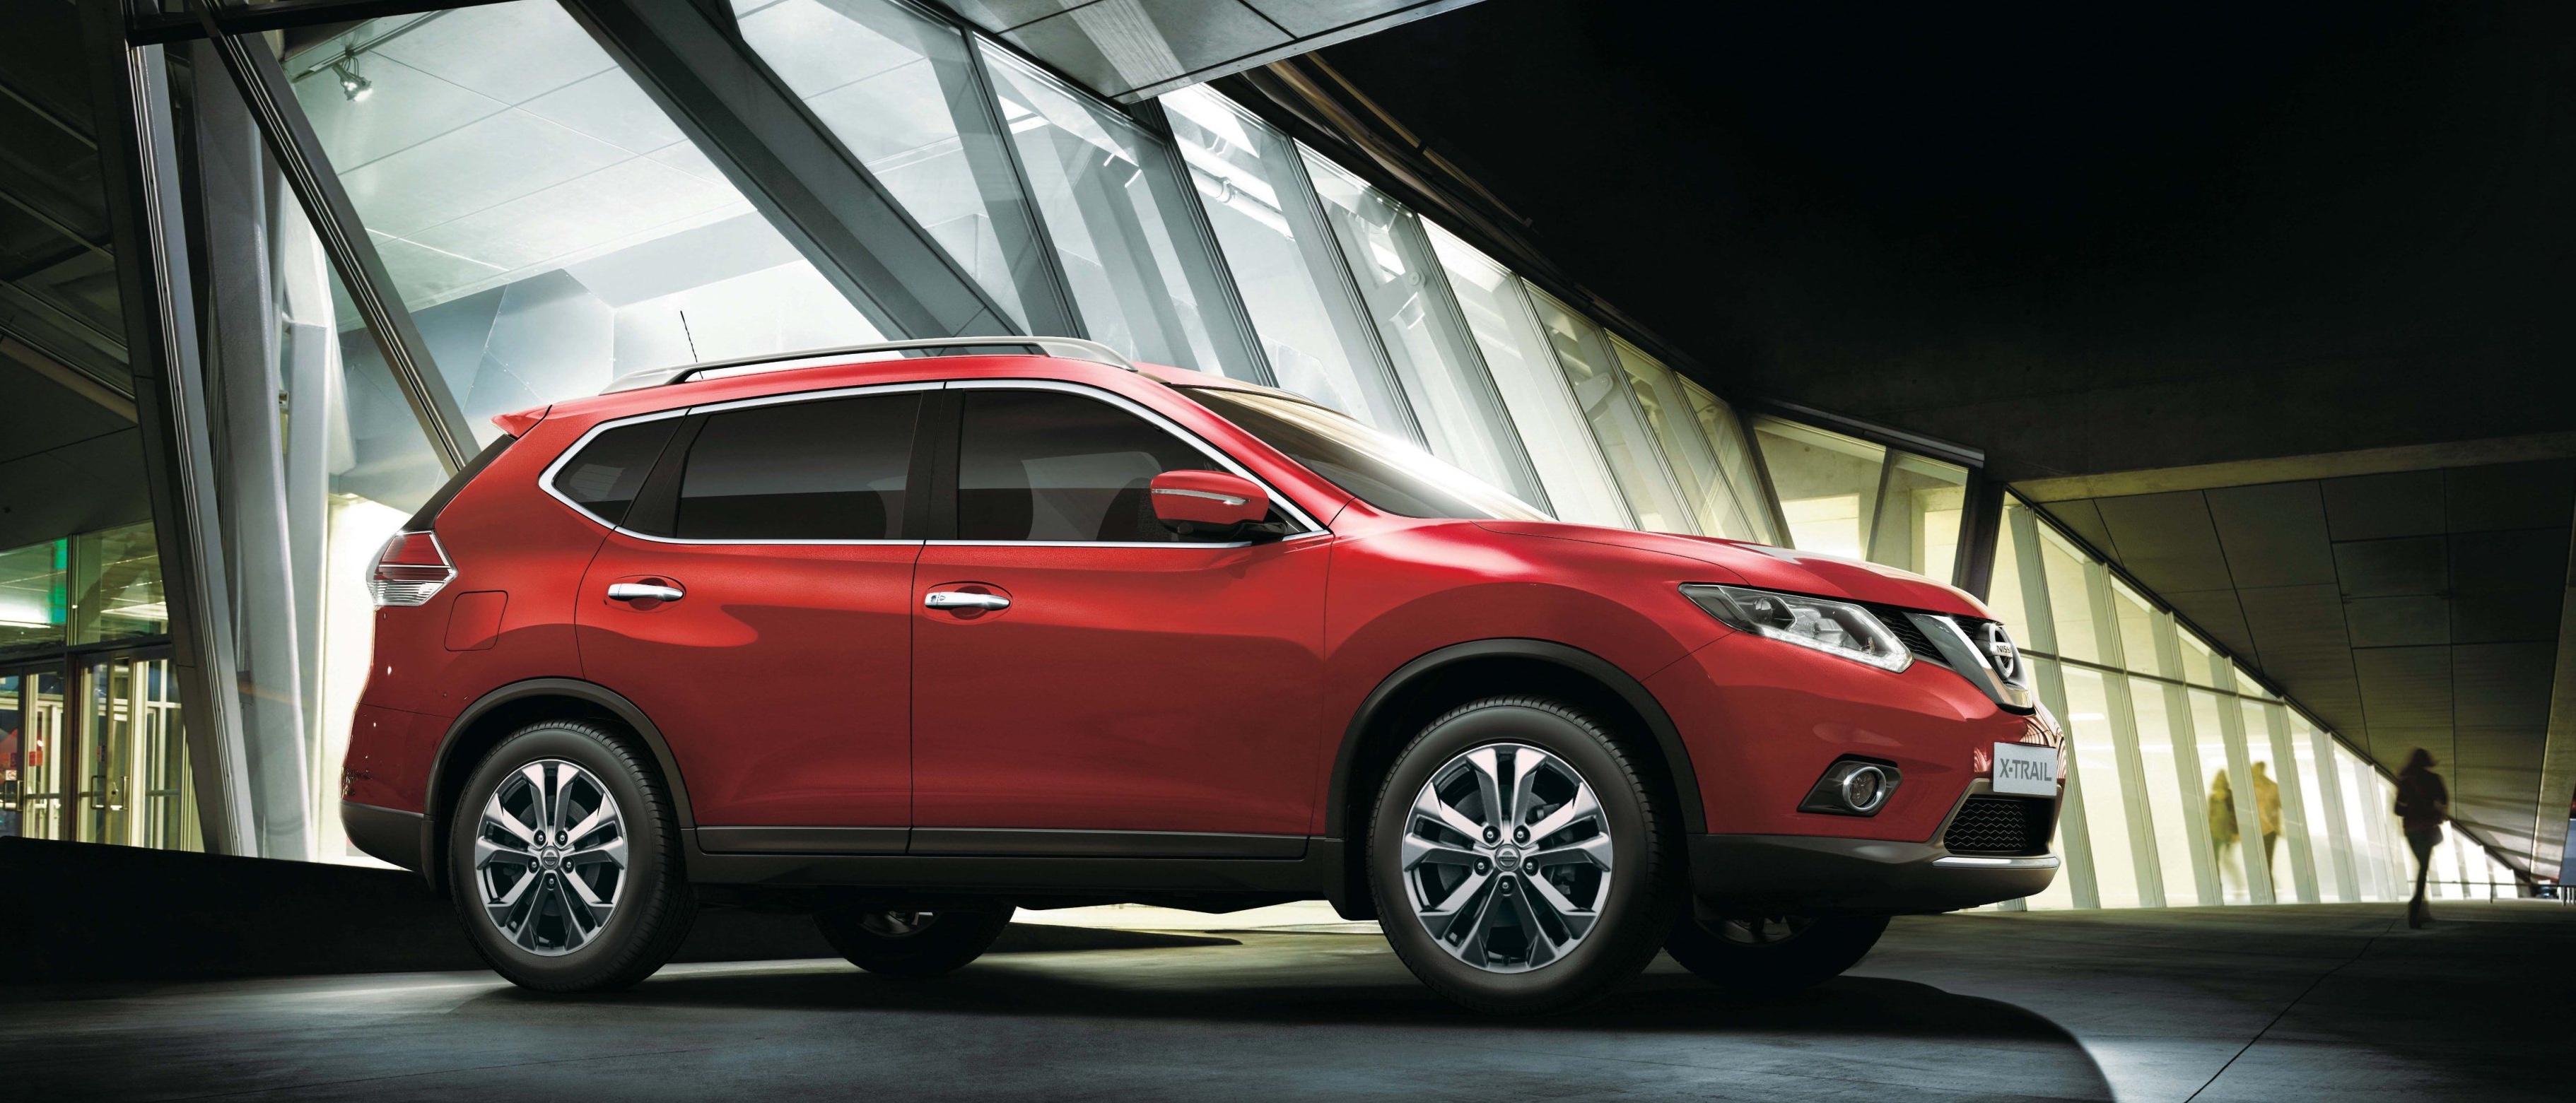 Nissan X-Trail kini dengan warna merah sempena CNY – Auto ...